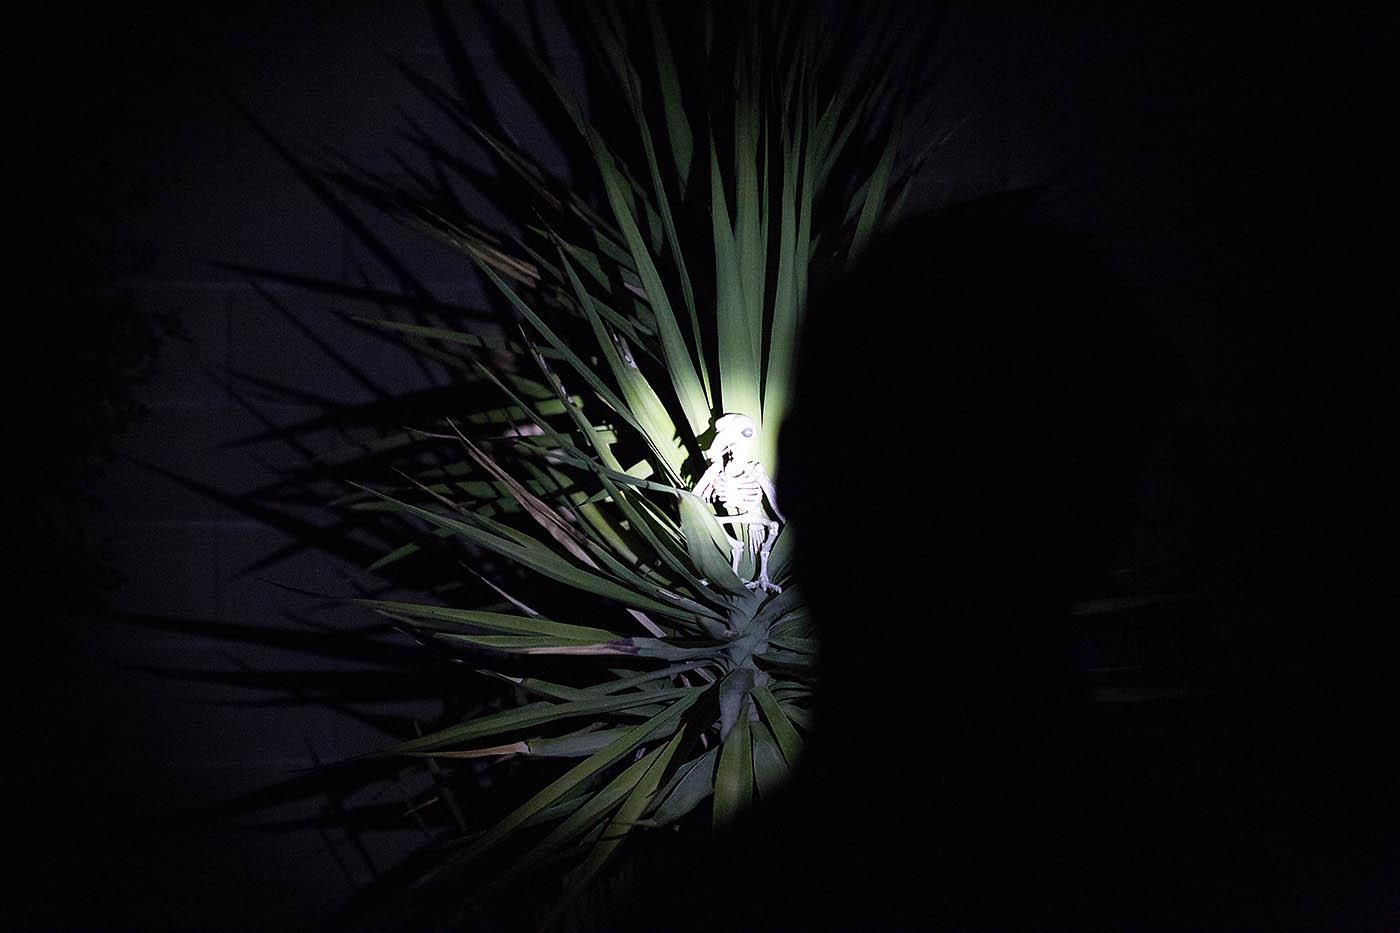 Animal skeleton flashlight hunt - fun activity or game for Halloween